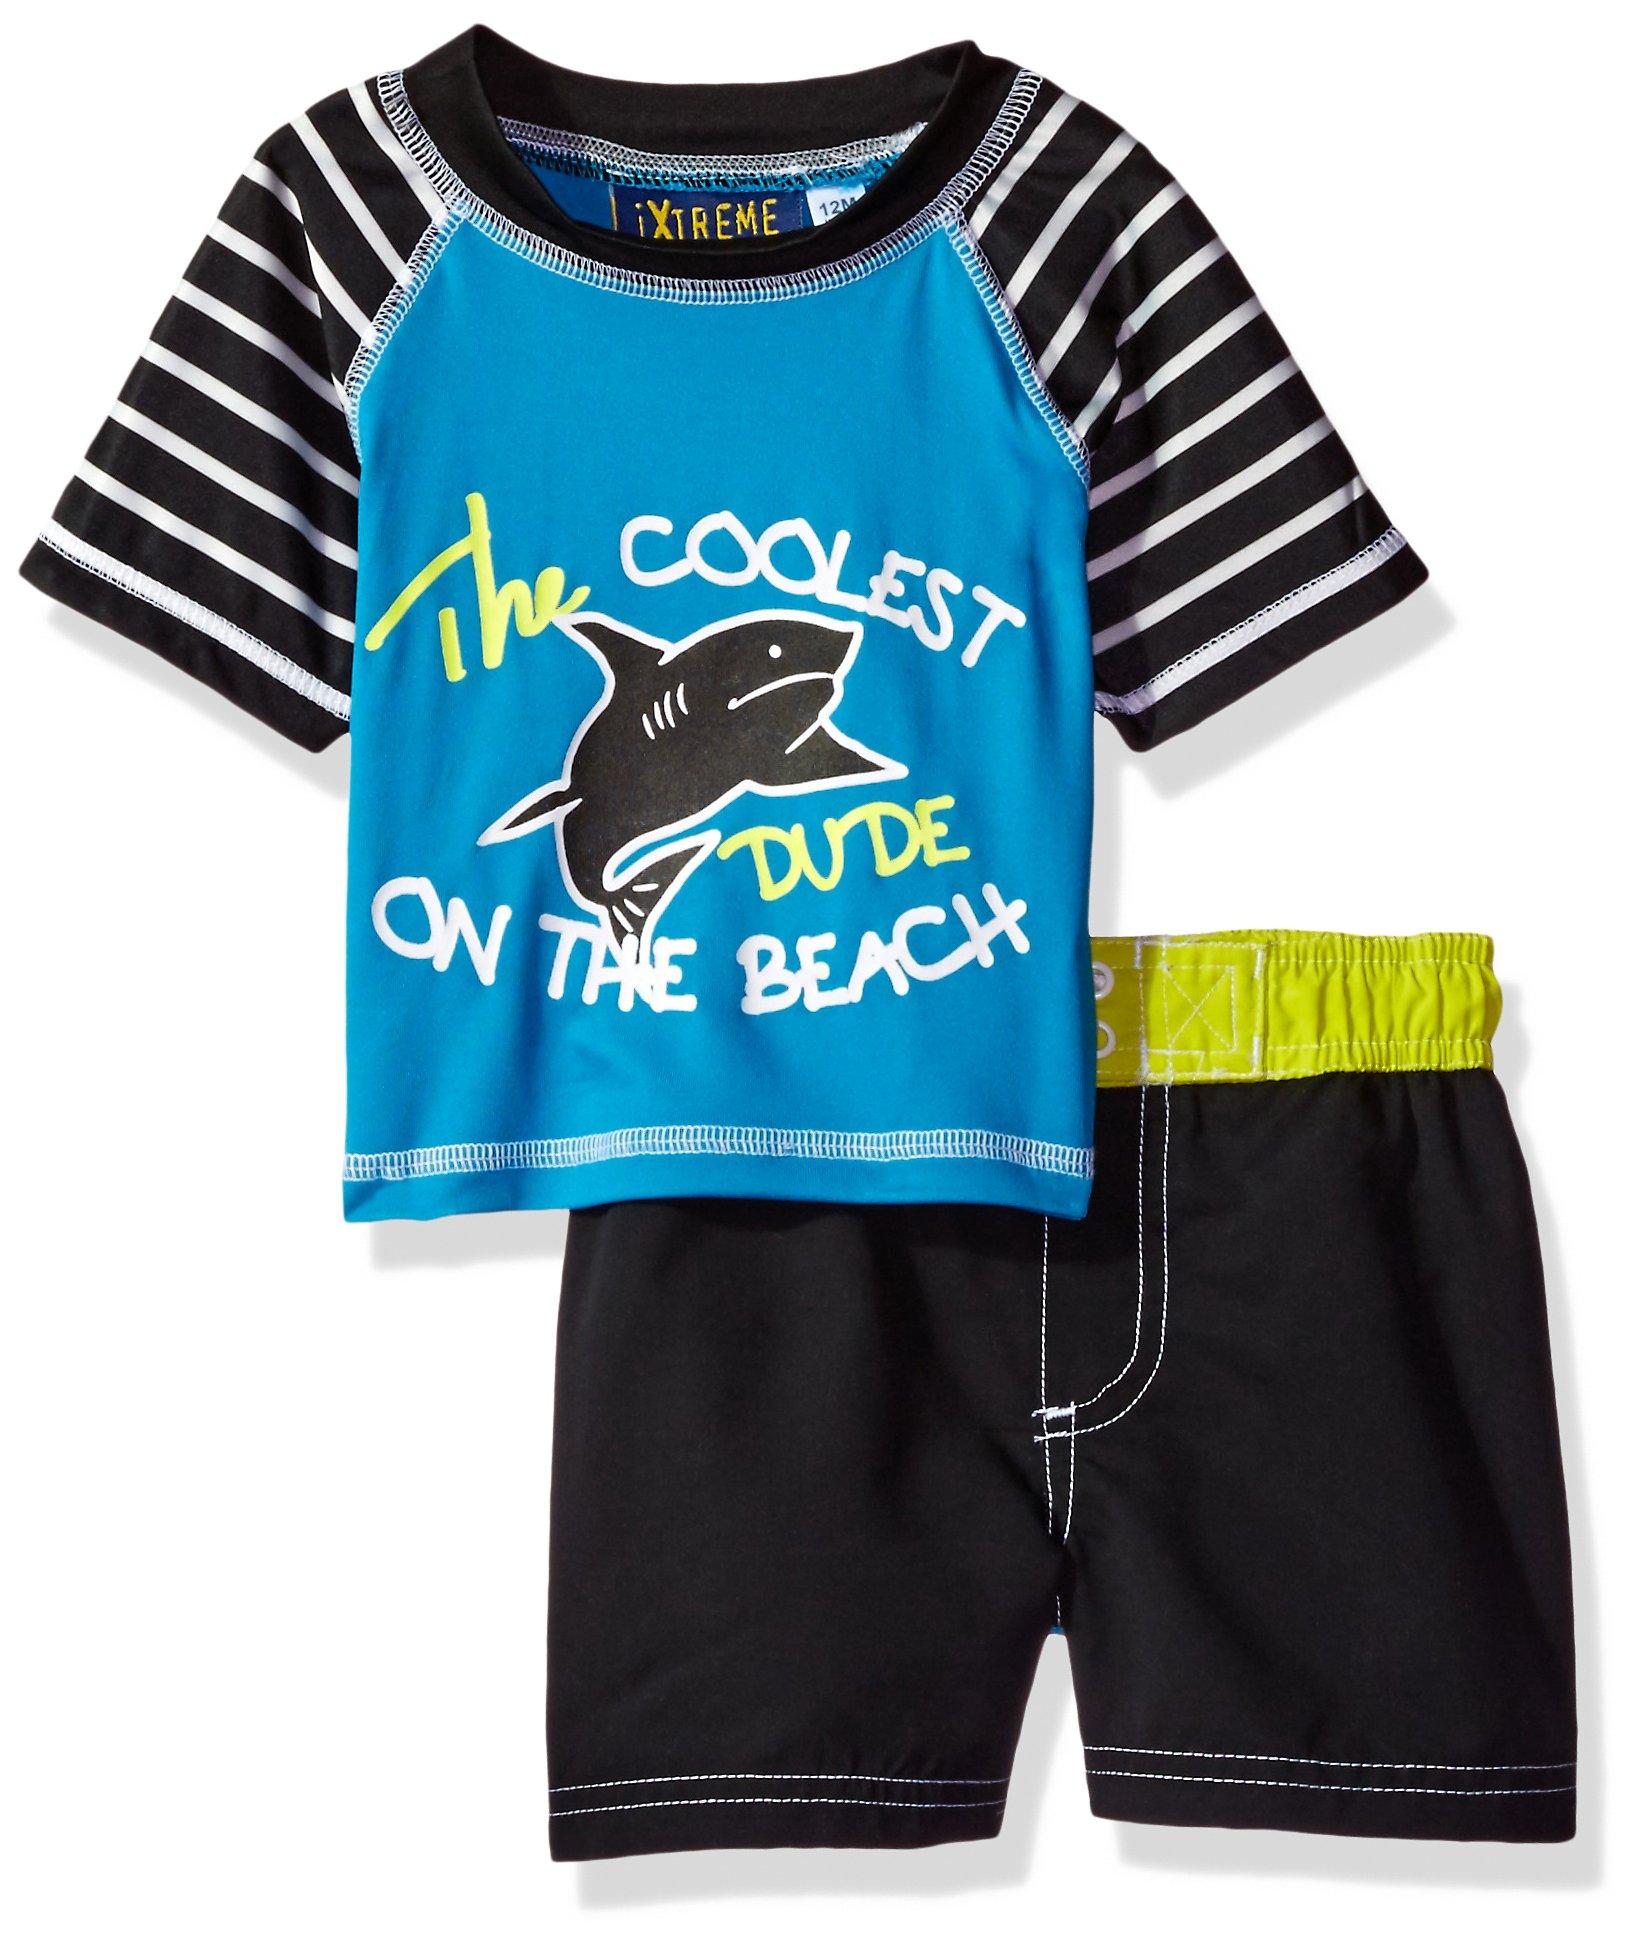 iXtreme Boys' Printed Rashguard Sets, Shark w Glasses Blue, 24M